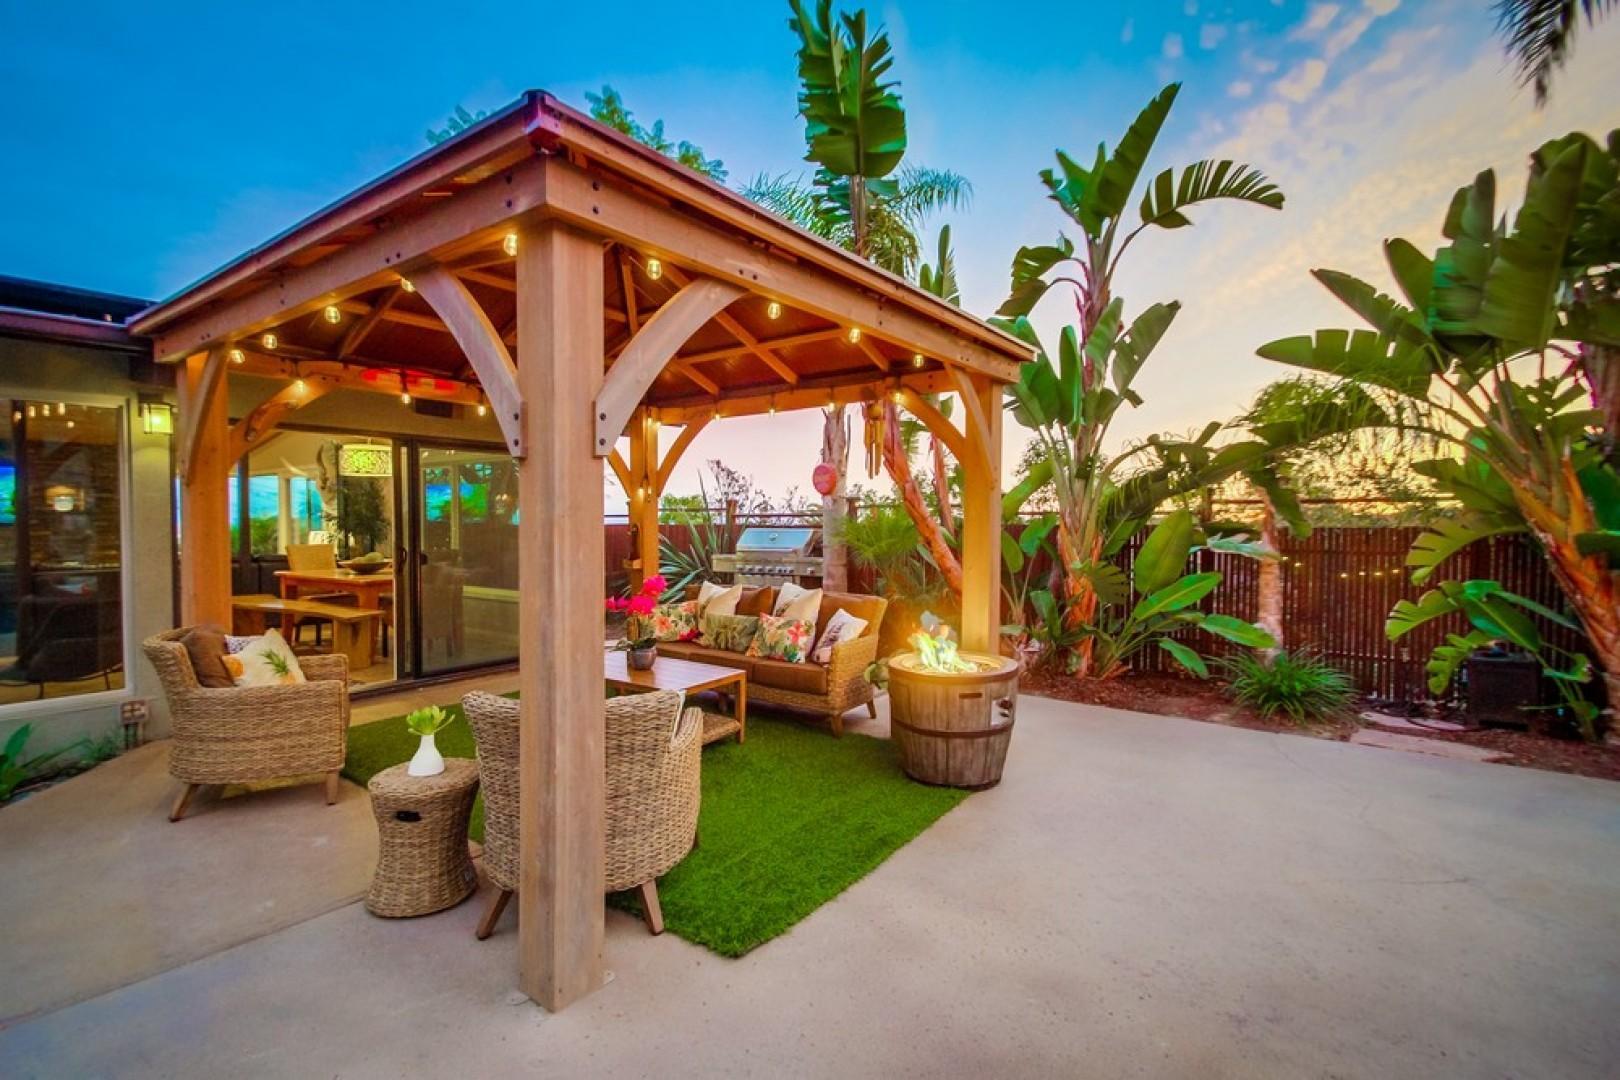 Pacific_Beach_Vacation_Rental_27